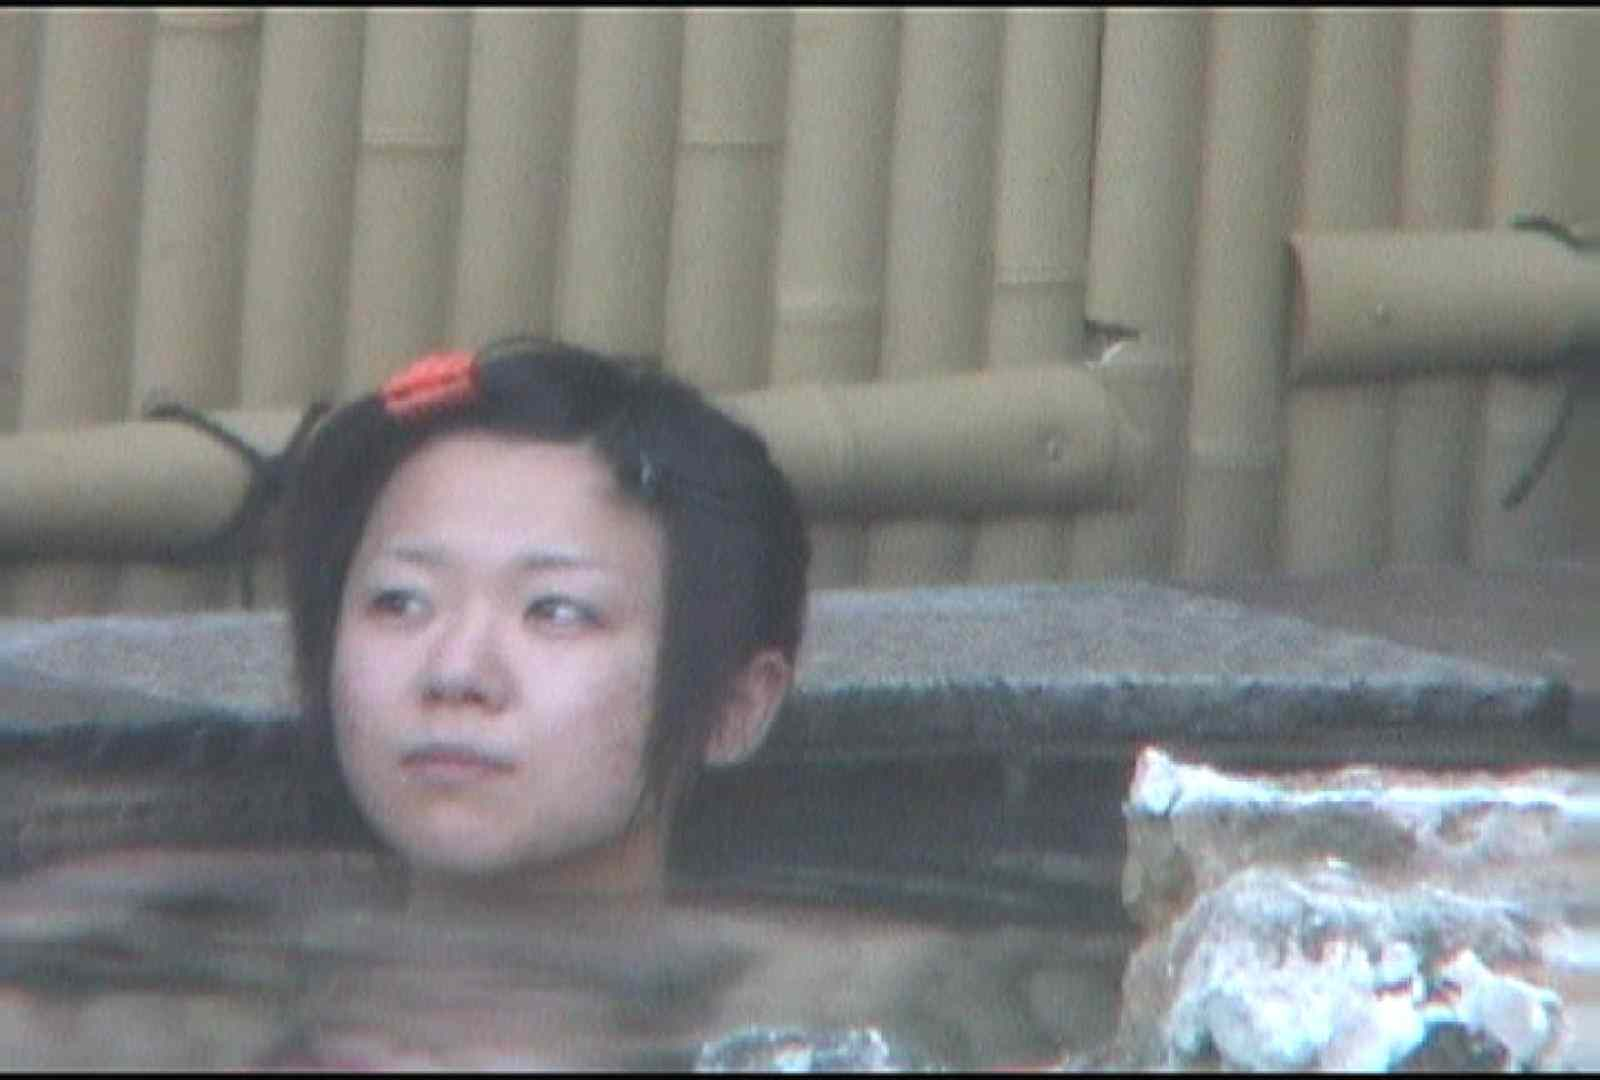 Aquaな露天風呂Vol.175 盗撮シリーズ | 露天風呂編  91PIX 45